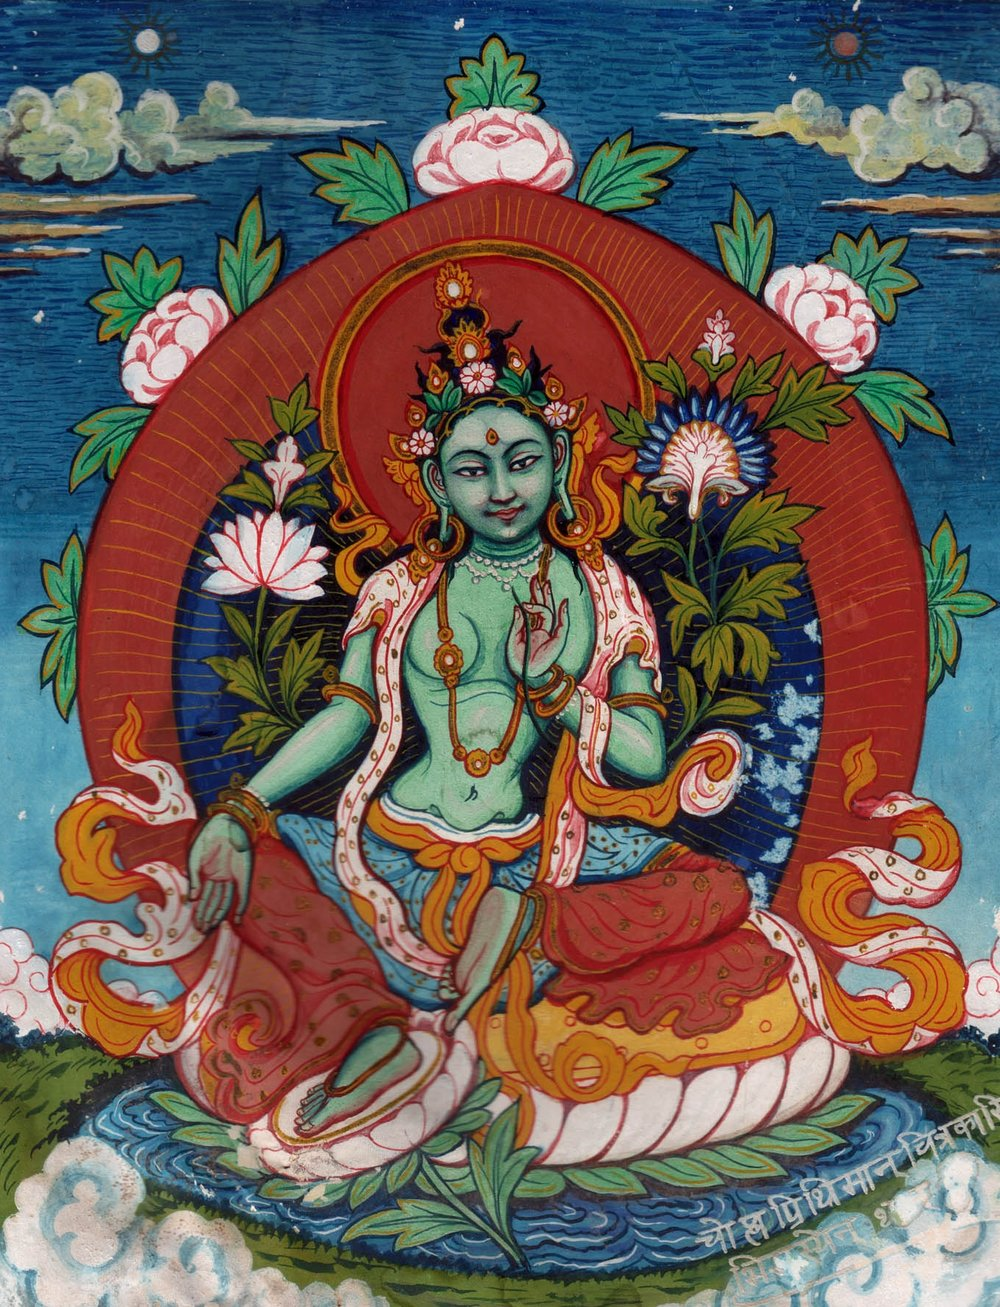 Green Tara from the Tibetans